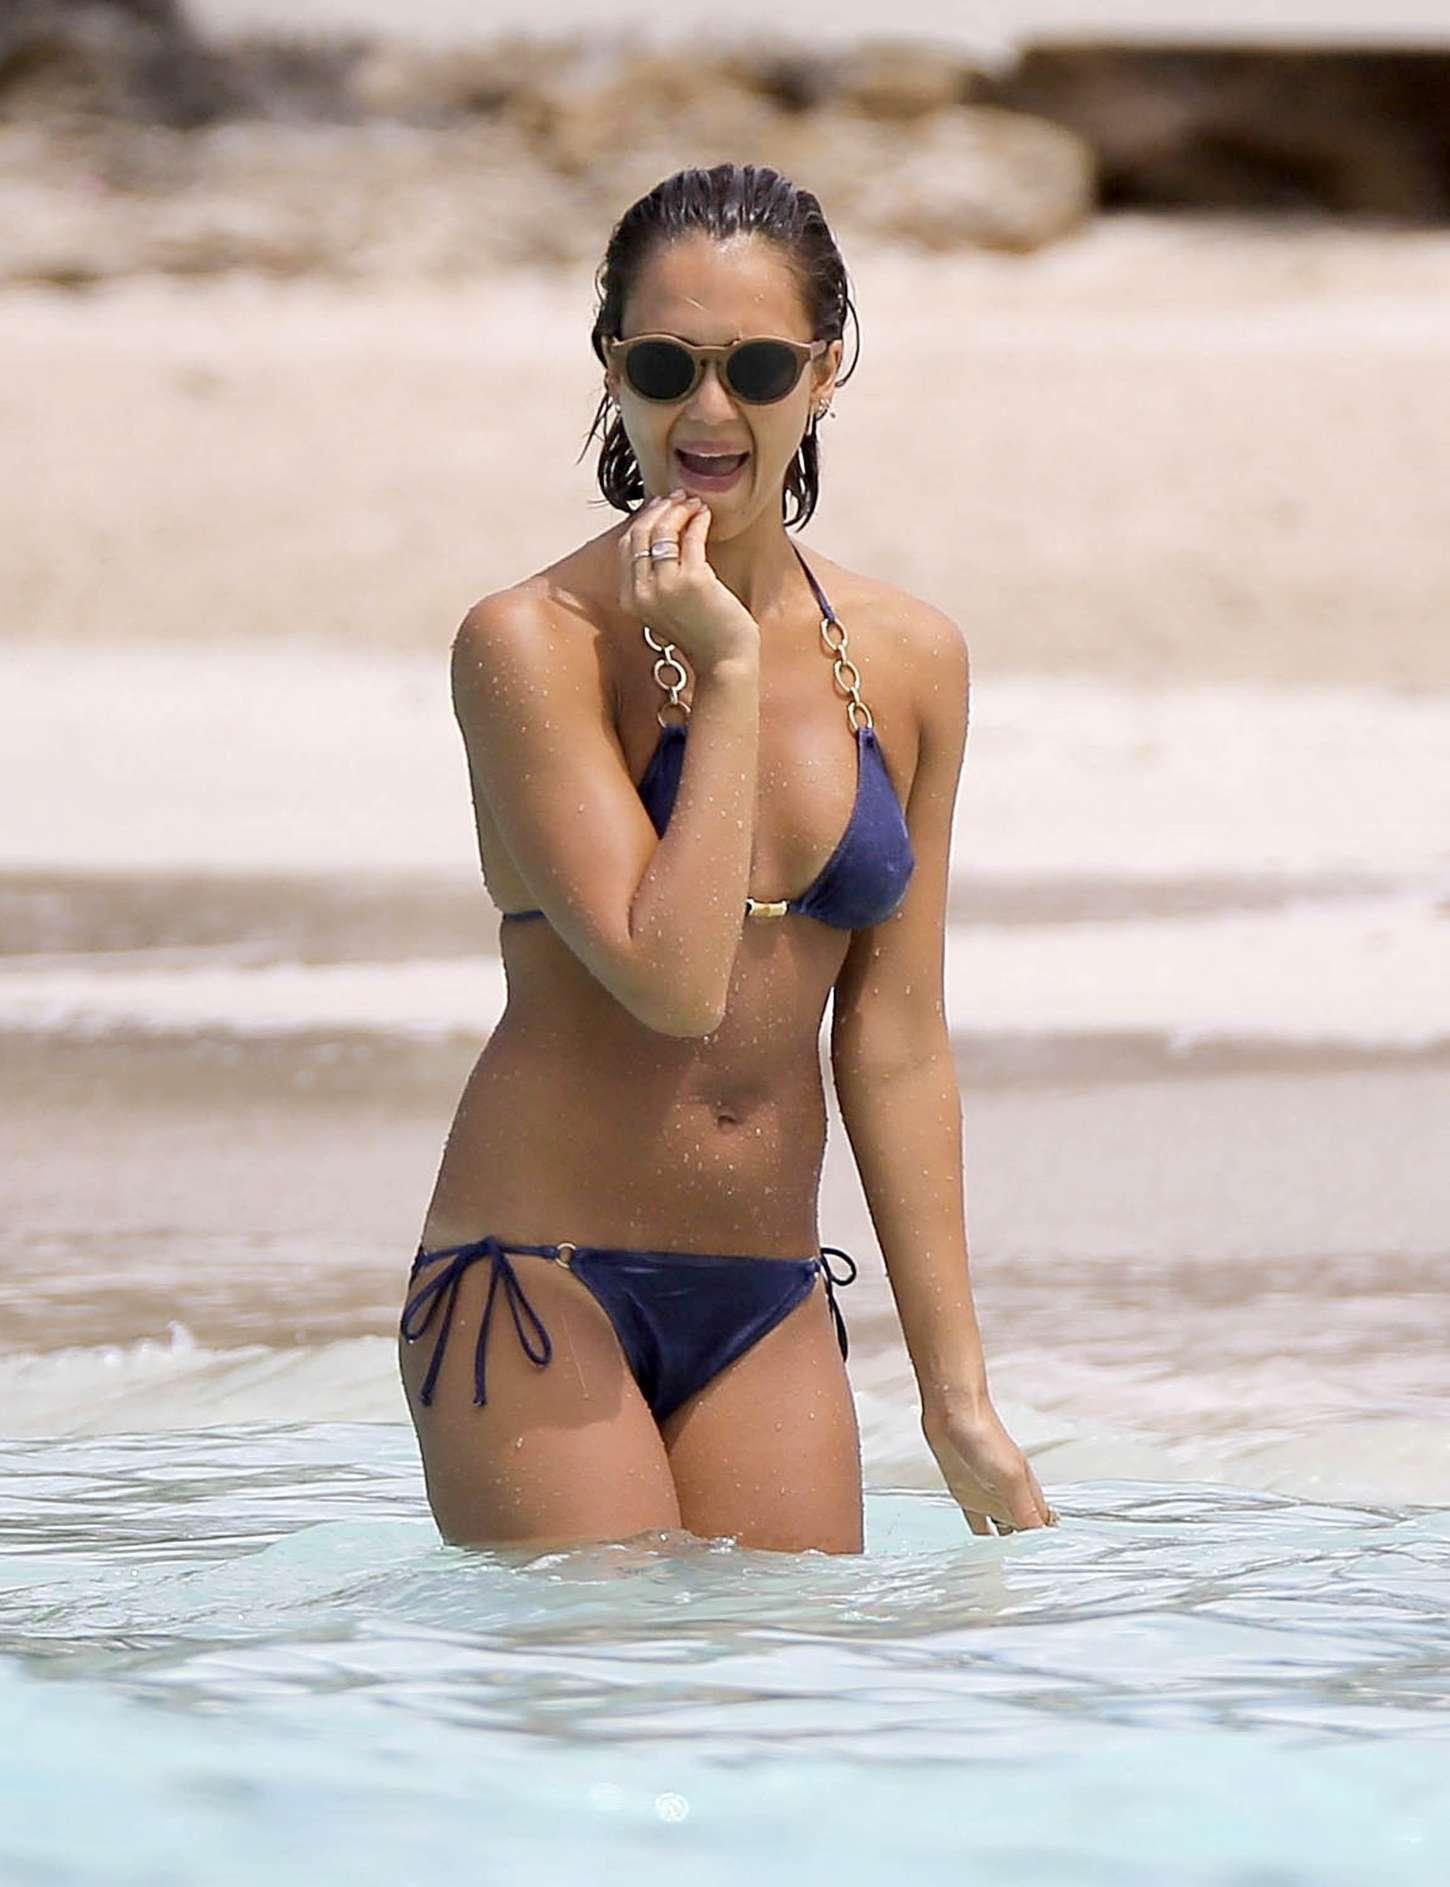 Bikini Indianara Carvalho naked (81 foto and video), Tits, Leaked, Twitter, cleavage 2006